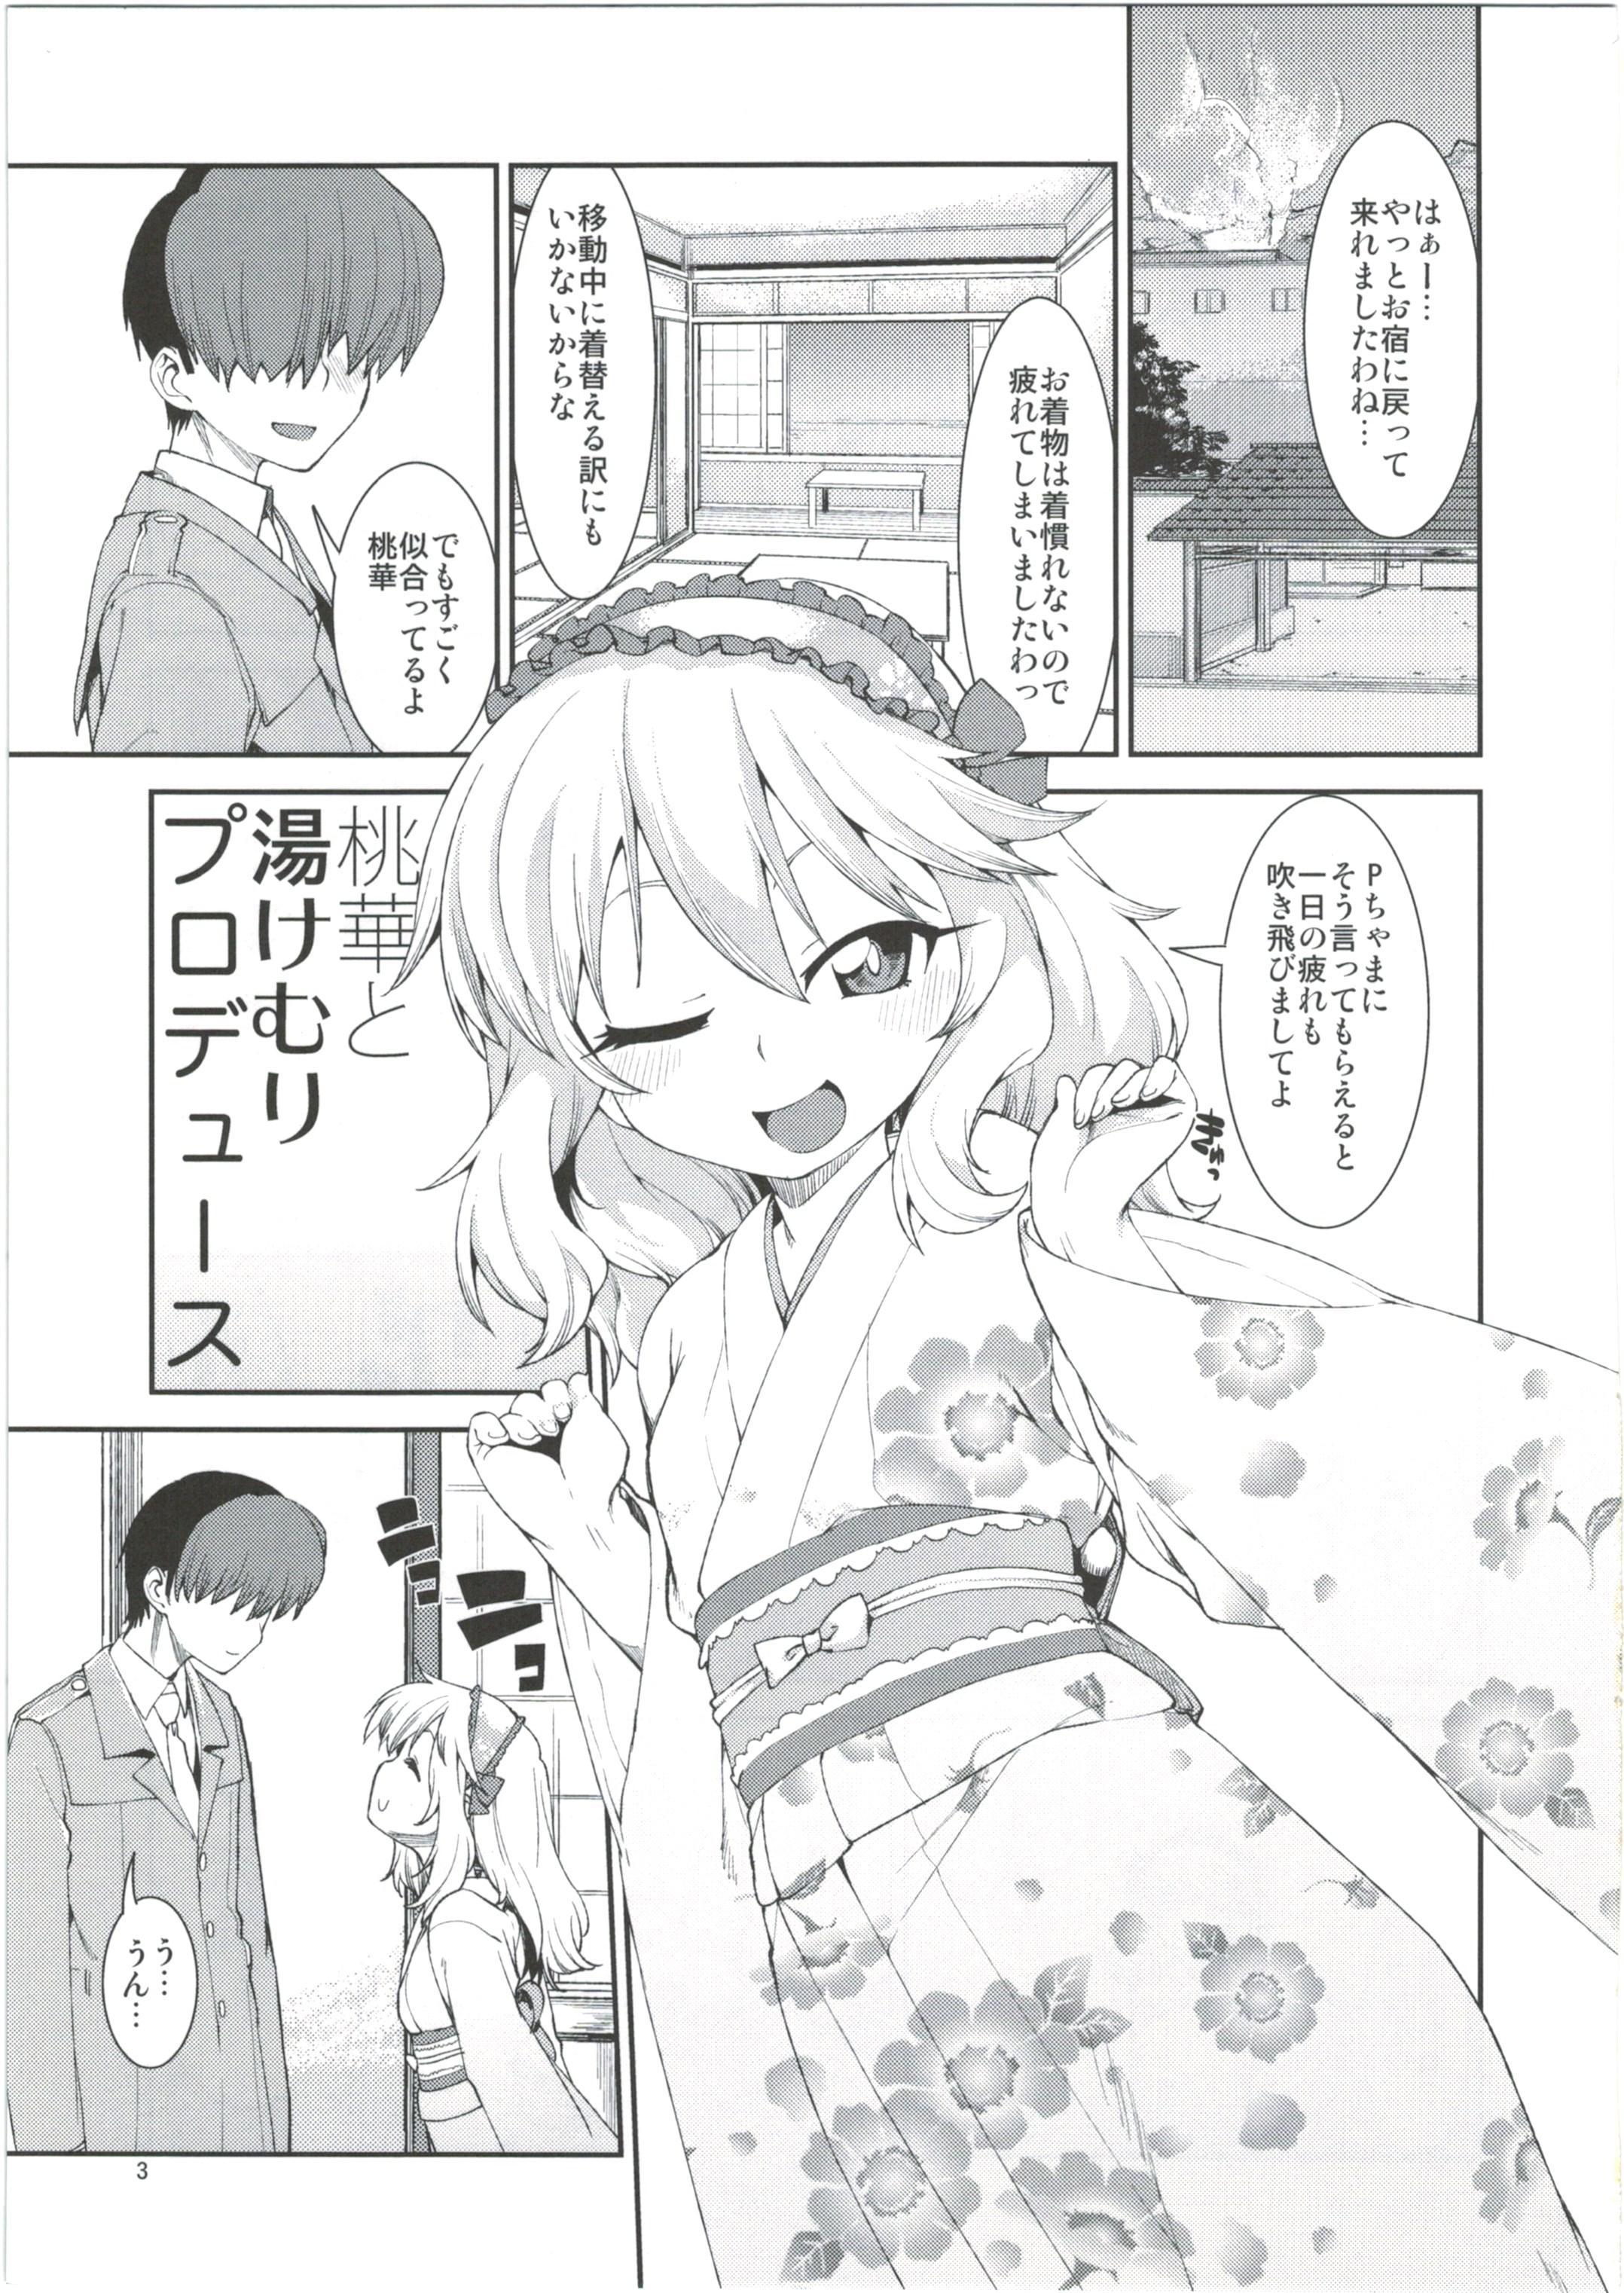 Momoka to Yukemuri Produce 4